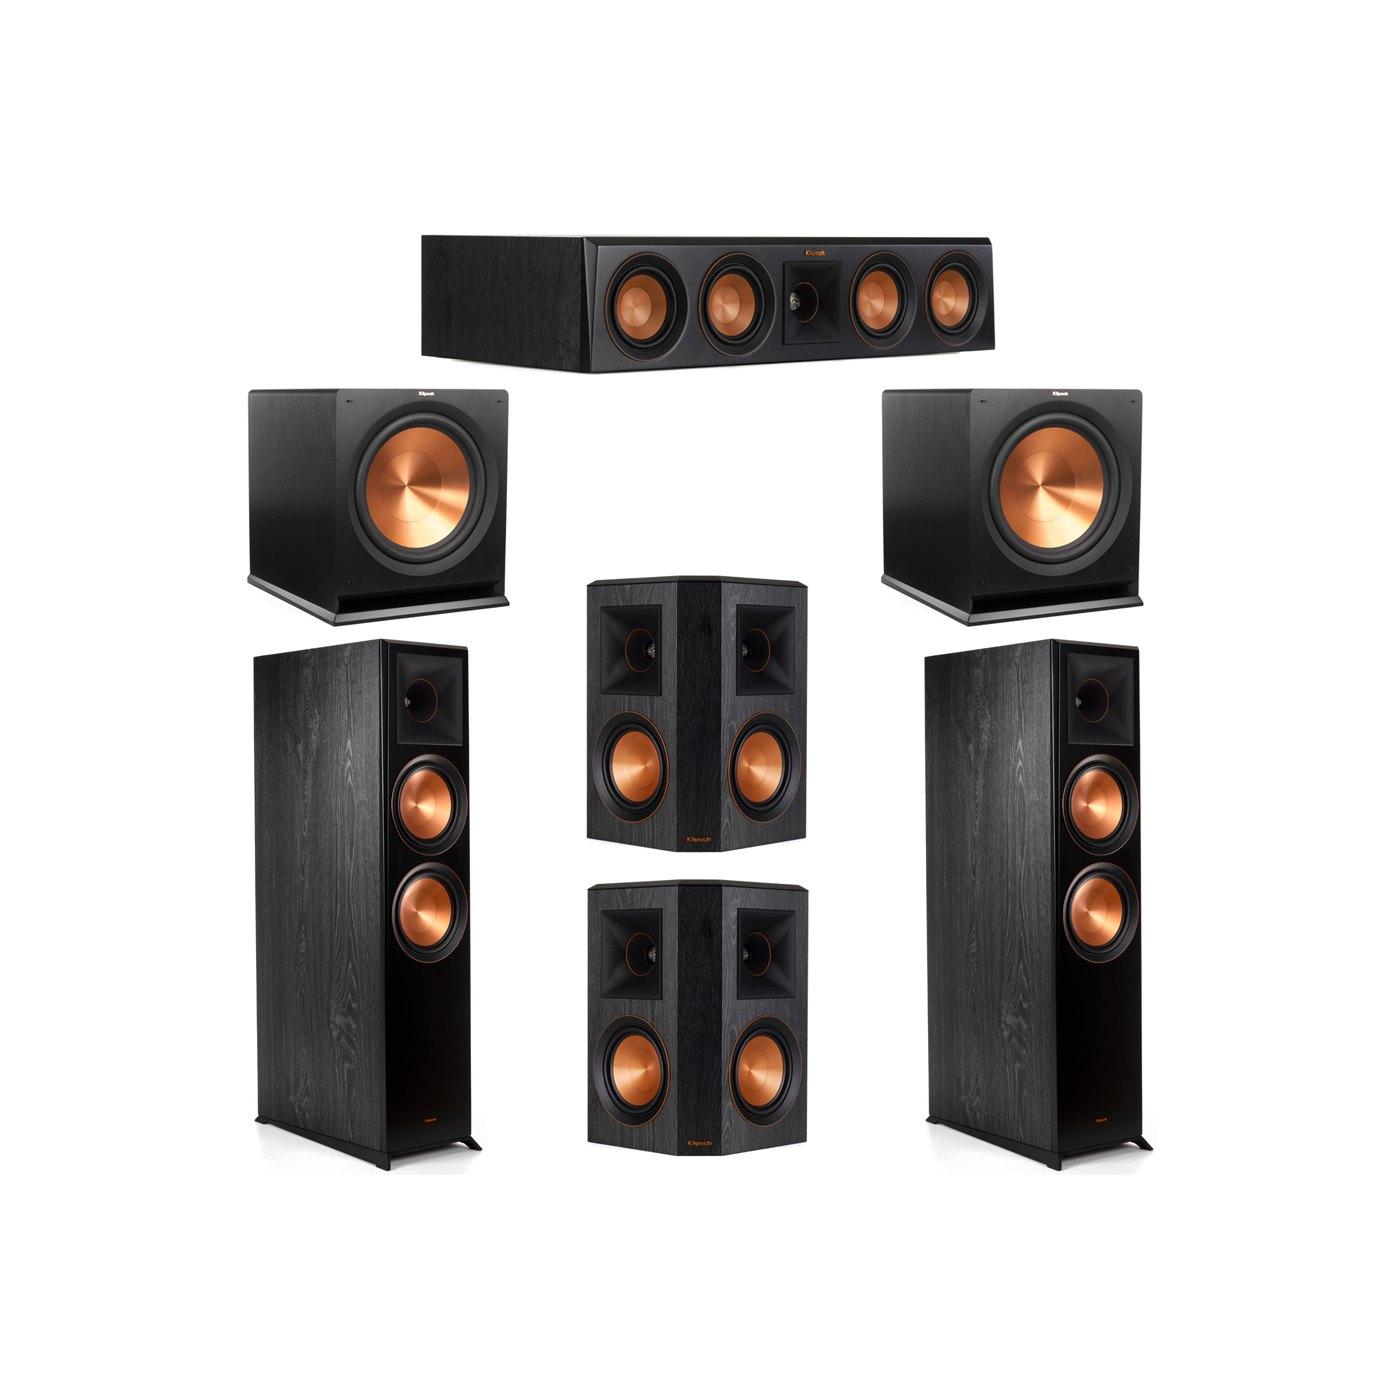 Klipsch 5.2 System with 2 RP-8000F Floorstanding Speakers, 1 Klipsch RP-404C Center Speaker, 2 Klipsch RP-502S Surround Speakers, 2 Klipsch R-115SW Subwoofers